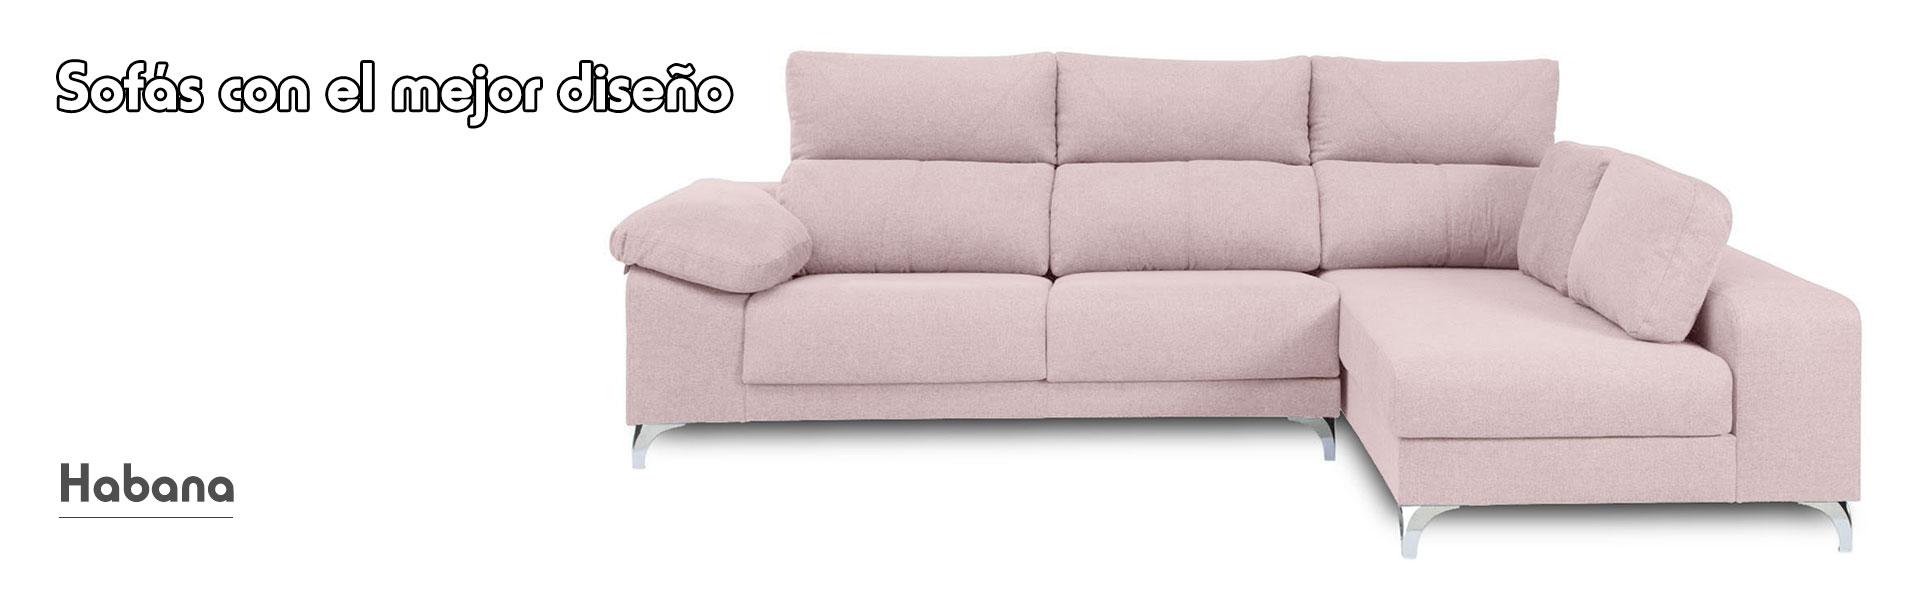 Sofa habana cuba bela rosa1